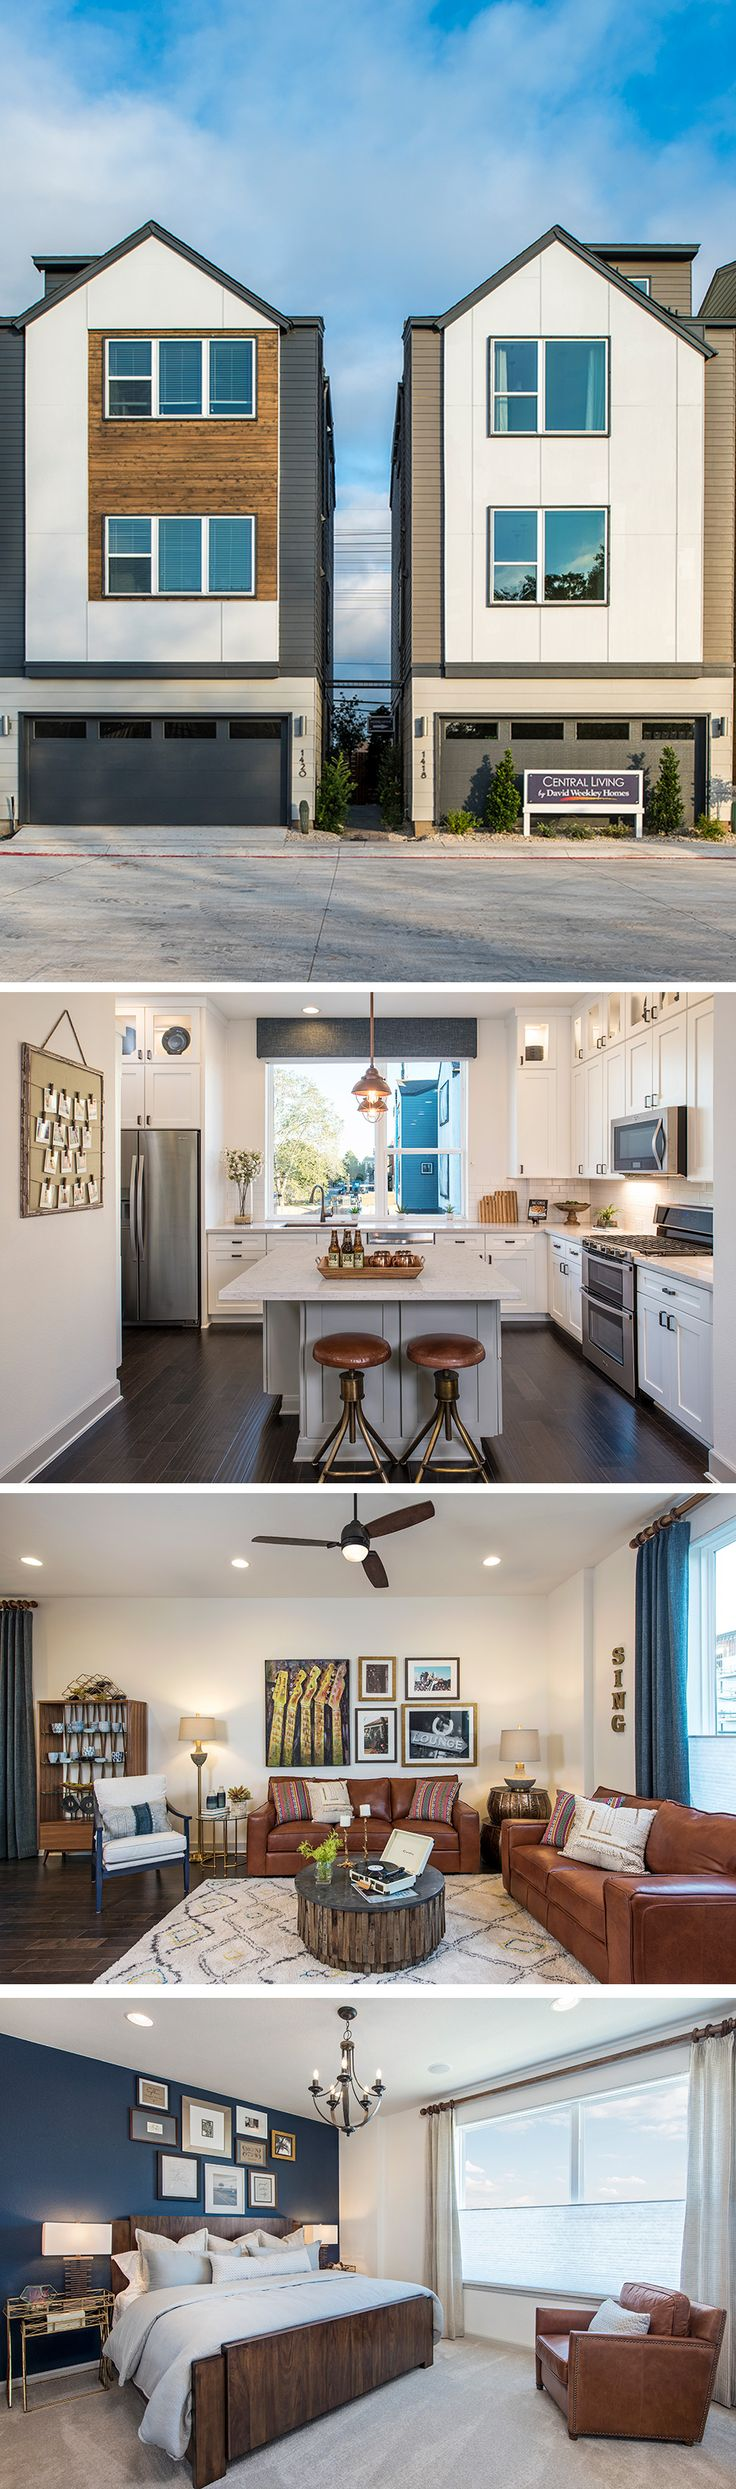 15 Best Austin TX Homes Images On Pinterest